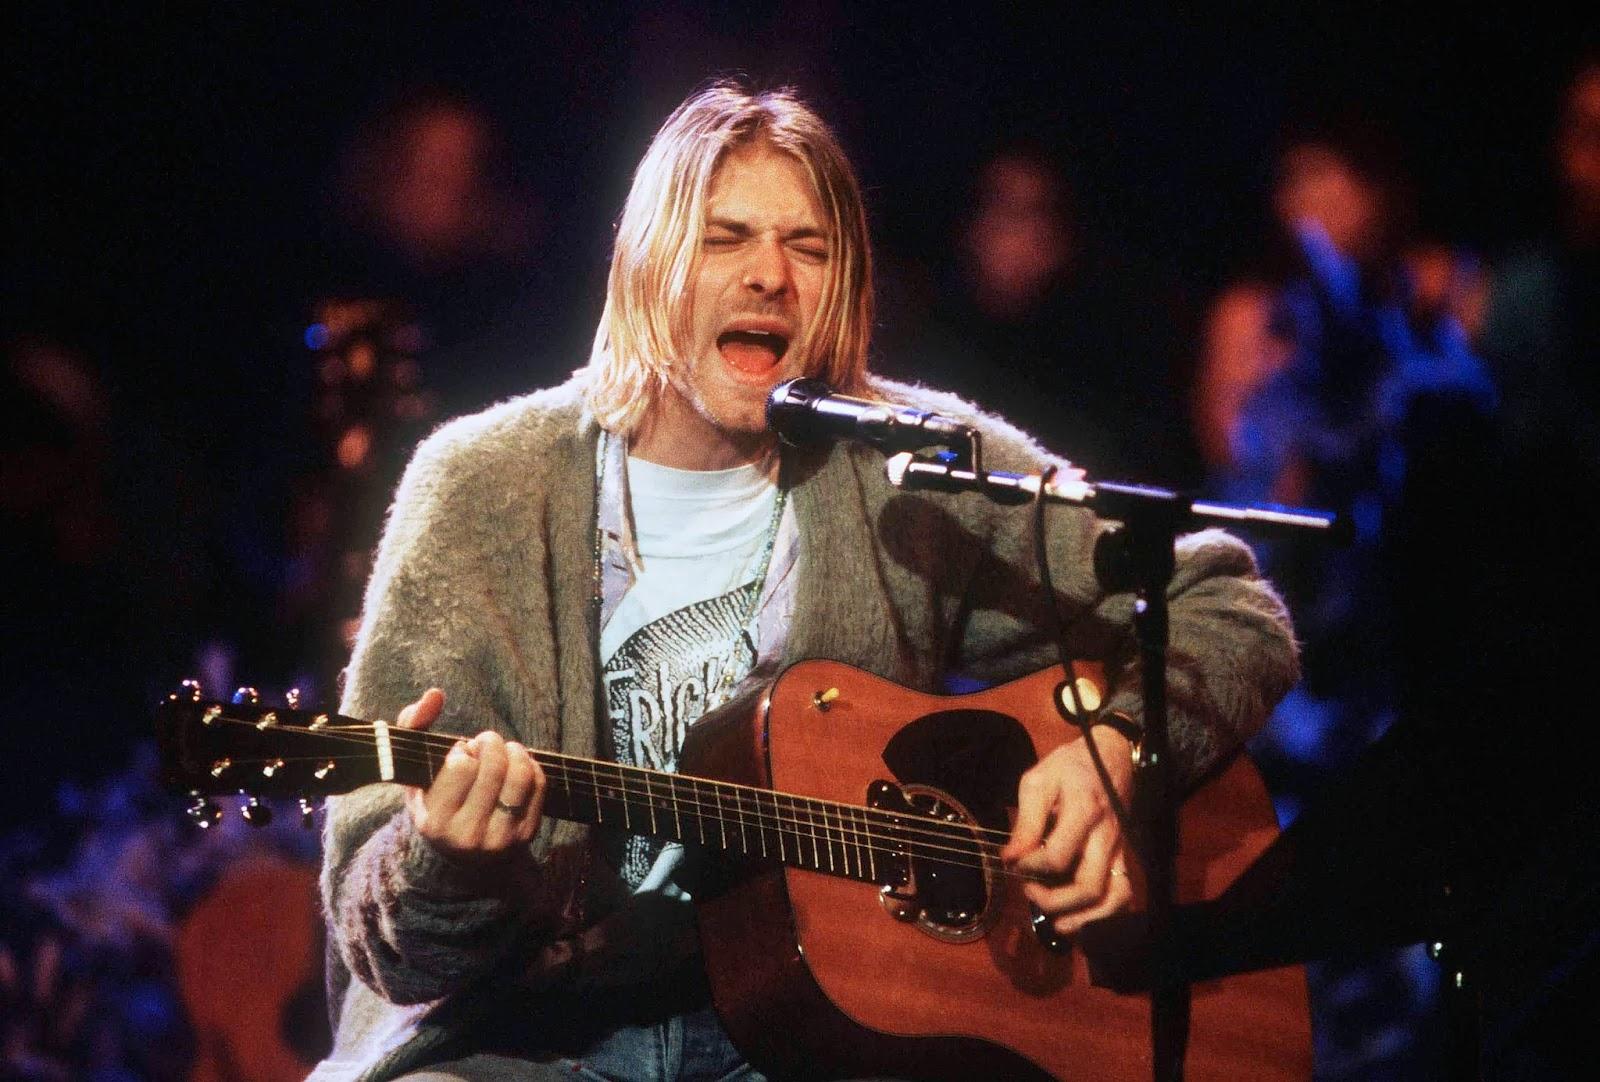 Hd wallpapers blog kurt cobain pictures - Kurt cobain nirvana wallpaper ...